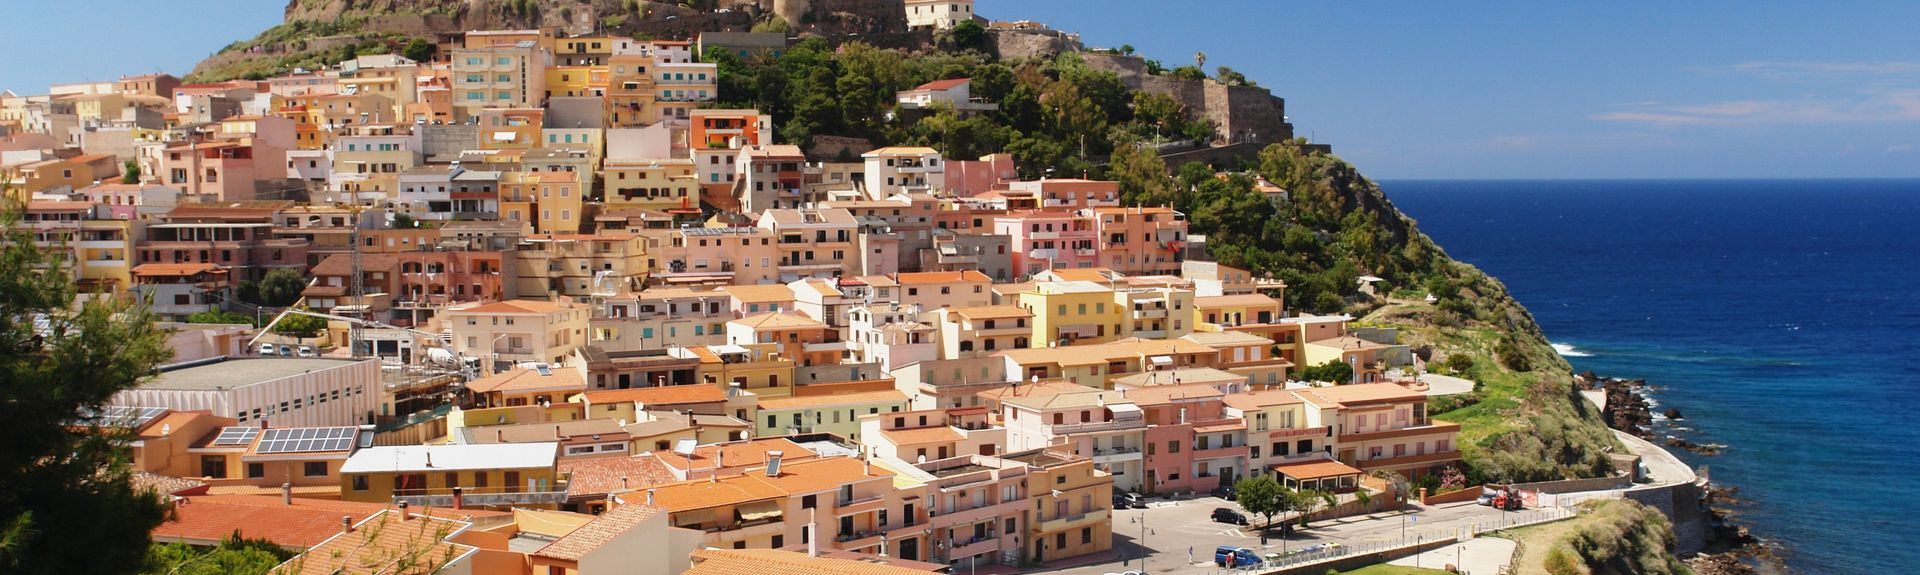 Castelsardo, Sardaigne, Italie